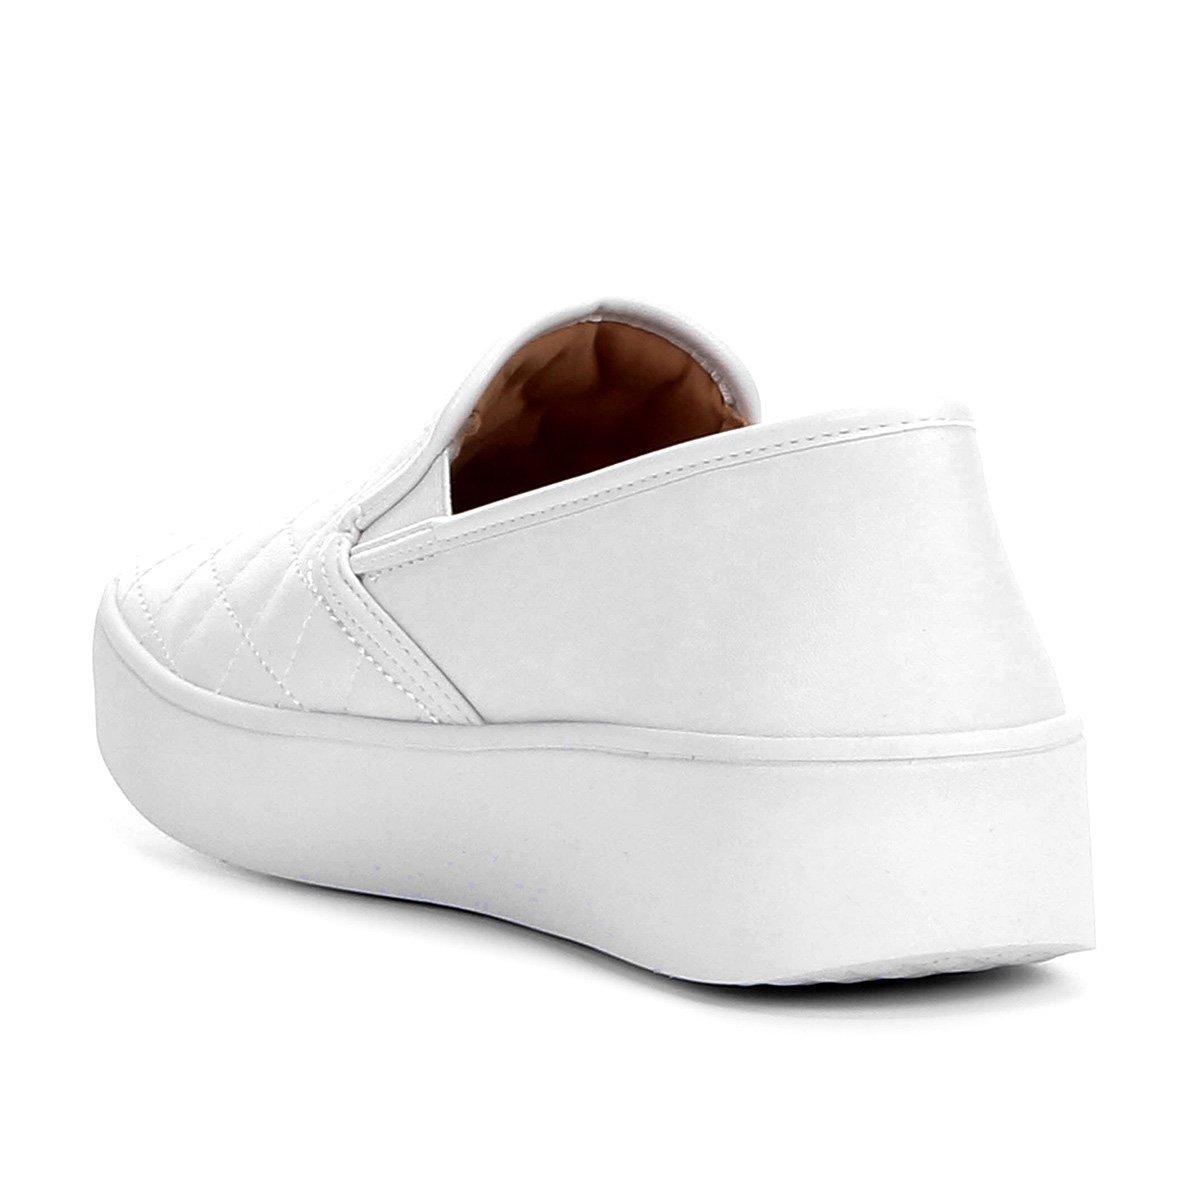 Ramarim On Branco Ramarim Feminino Matelassê On Branco Slip Feminino On Slip Slip Matelassê EWUHa6Ugq8